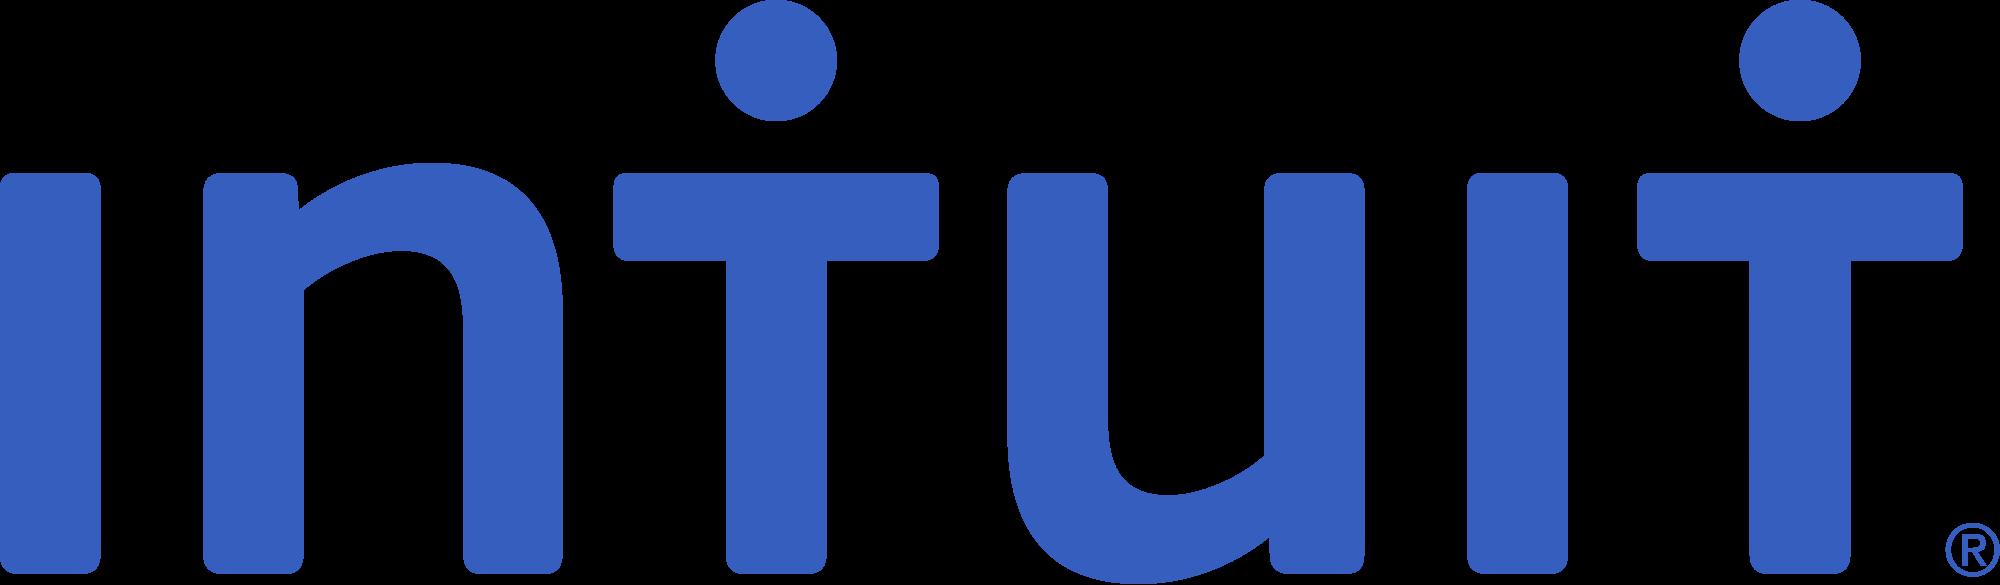 Intuit logo.png